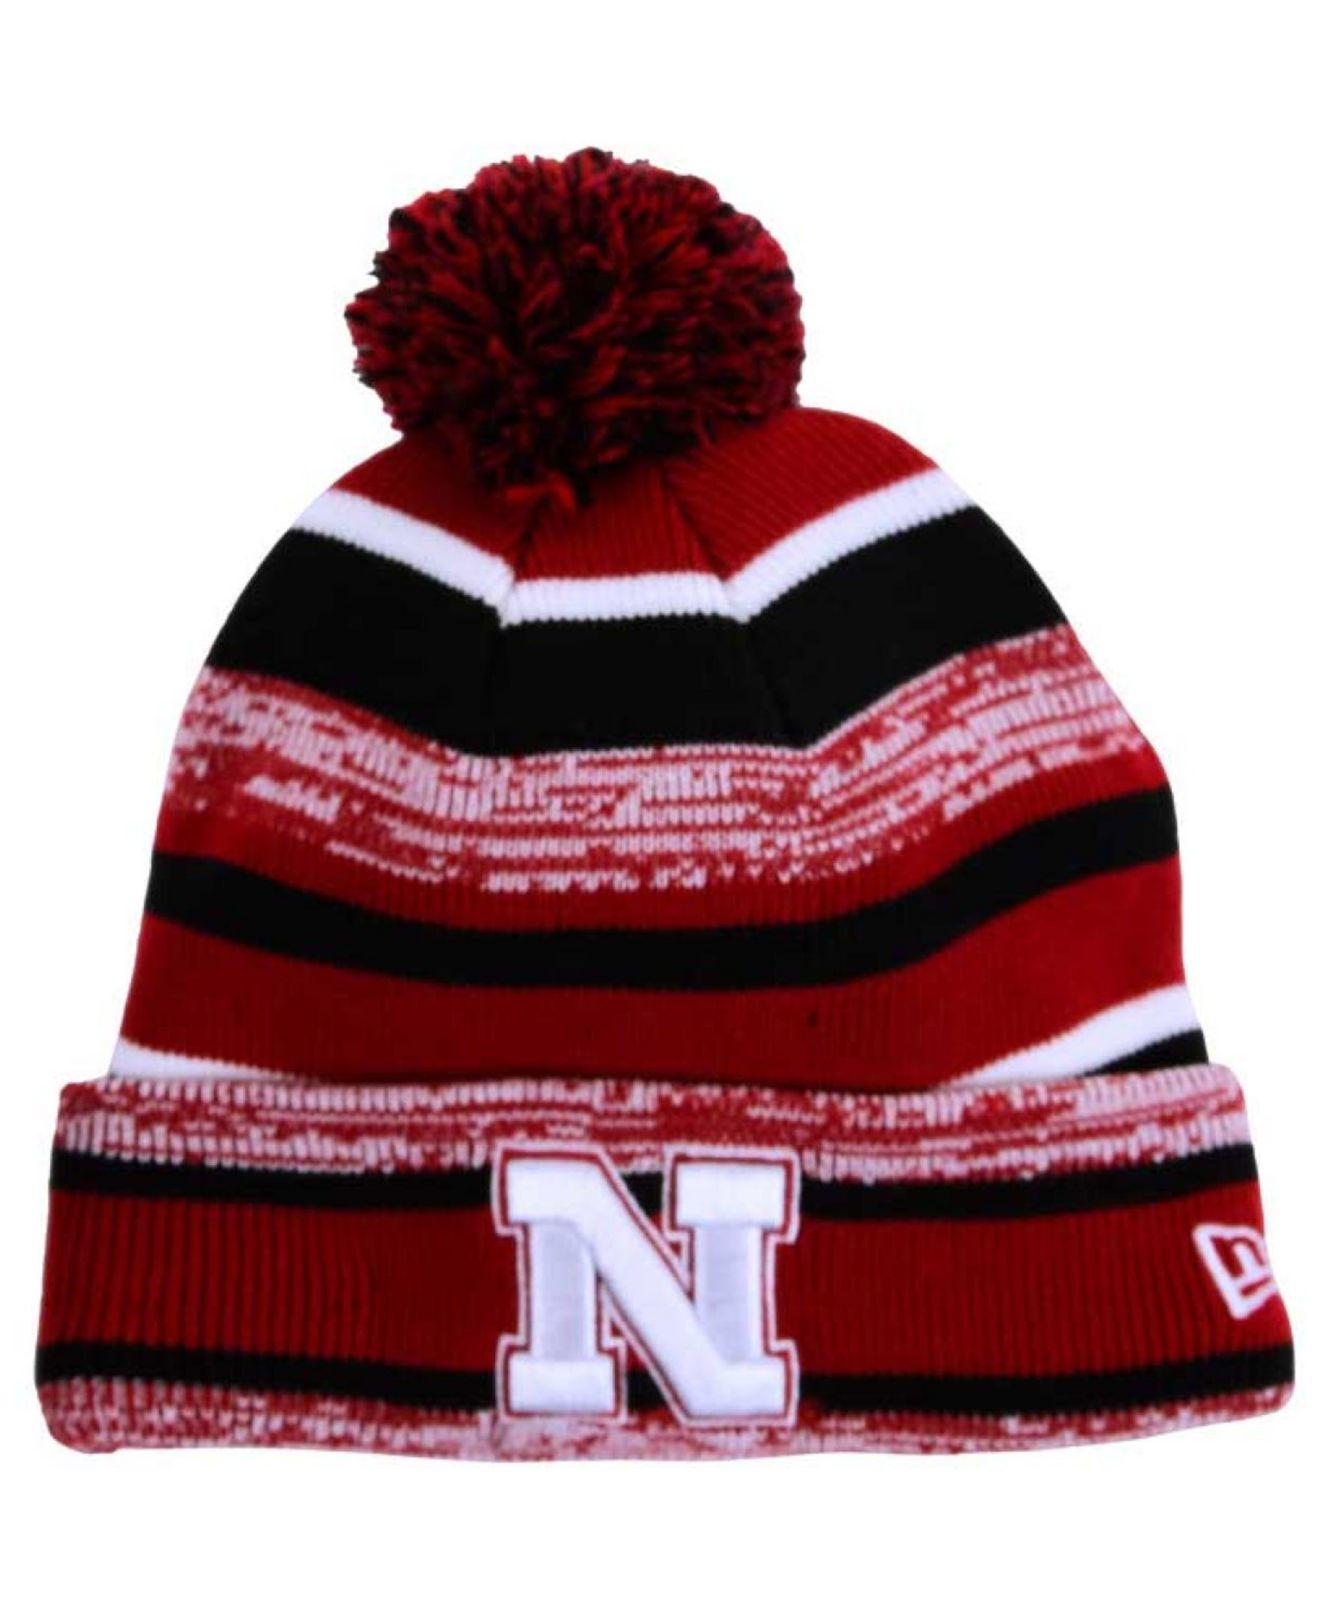 ... 50% off lyst ktz nebraska cornhuskers sport knit hat in gray for men  813d2 77ad1 d96f08089064